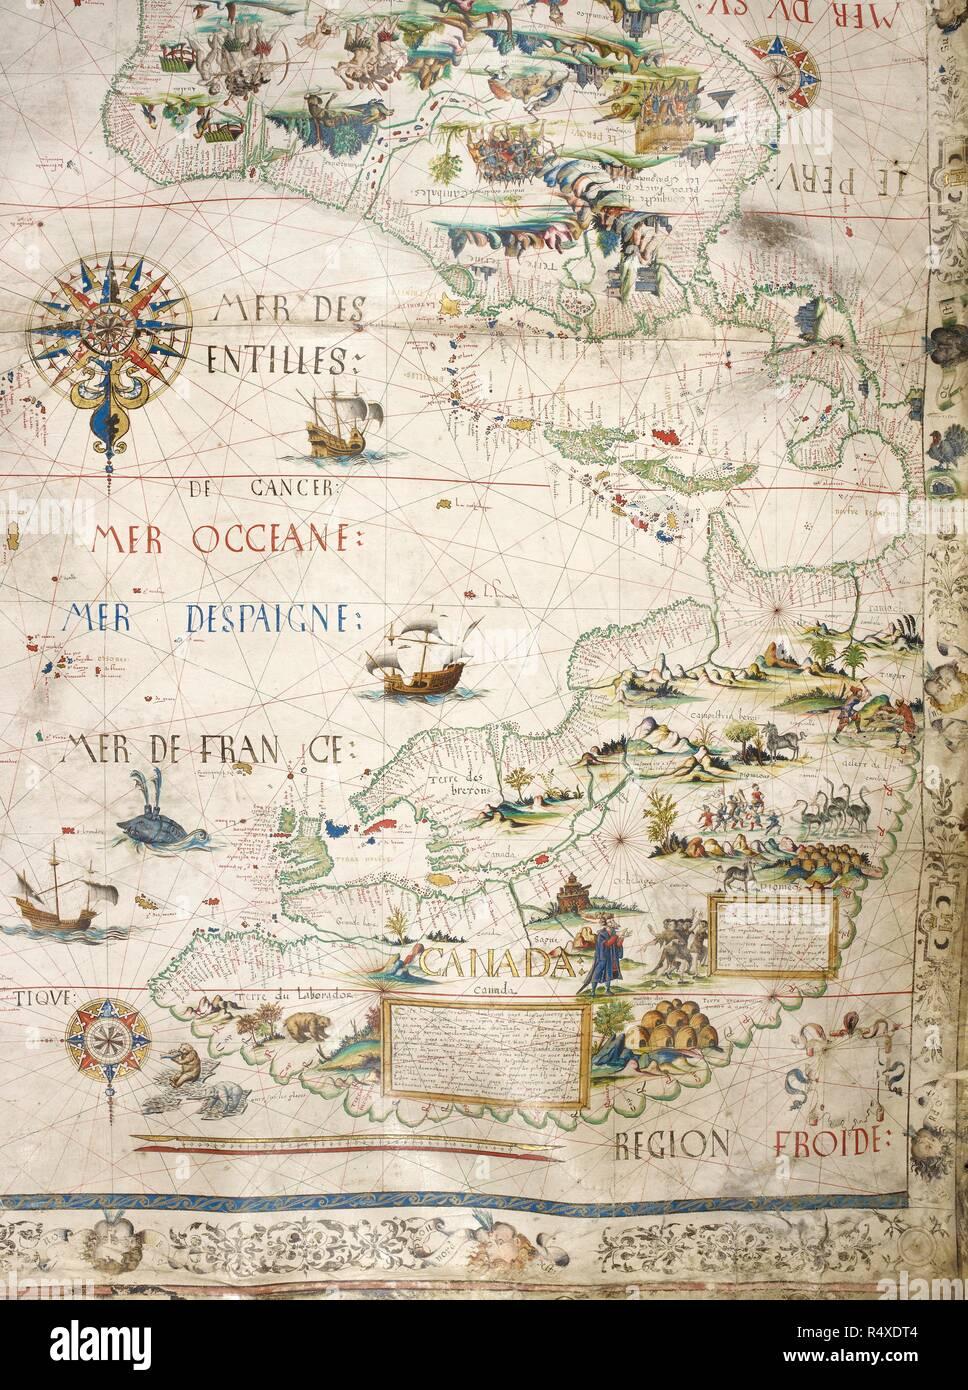 Carte Historique Canada.Carte Du Canada Un Velin Historique Carte Peint Des